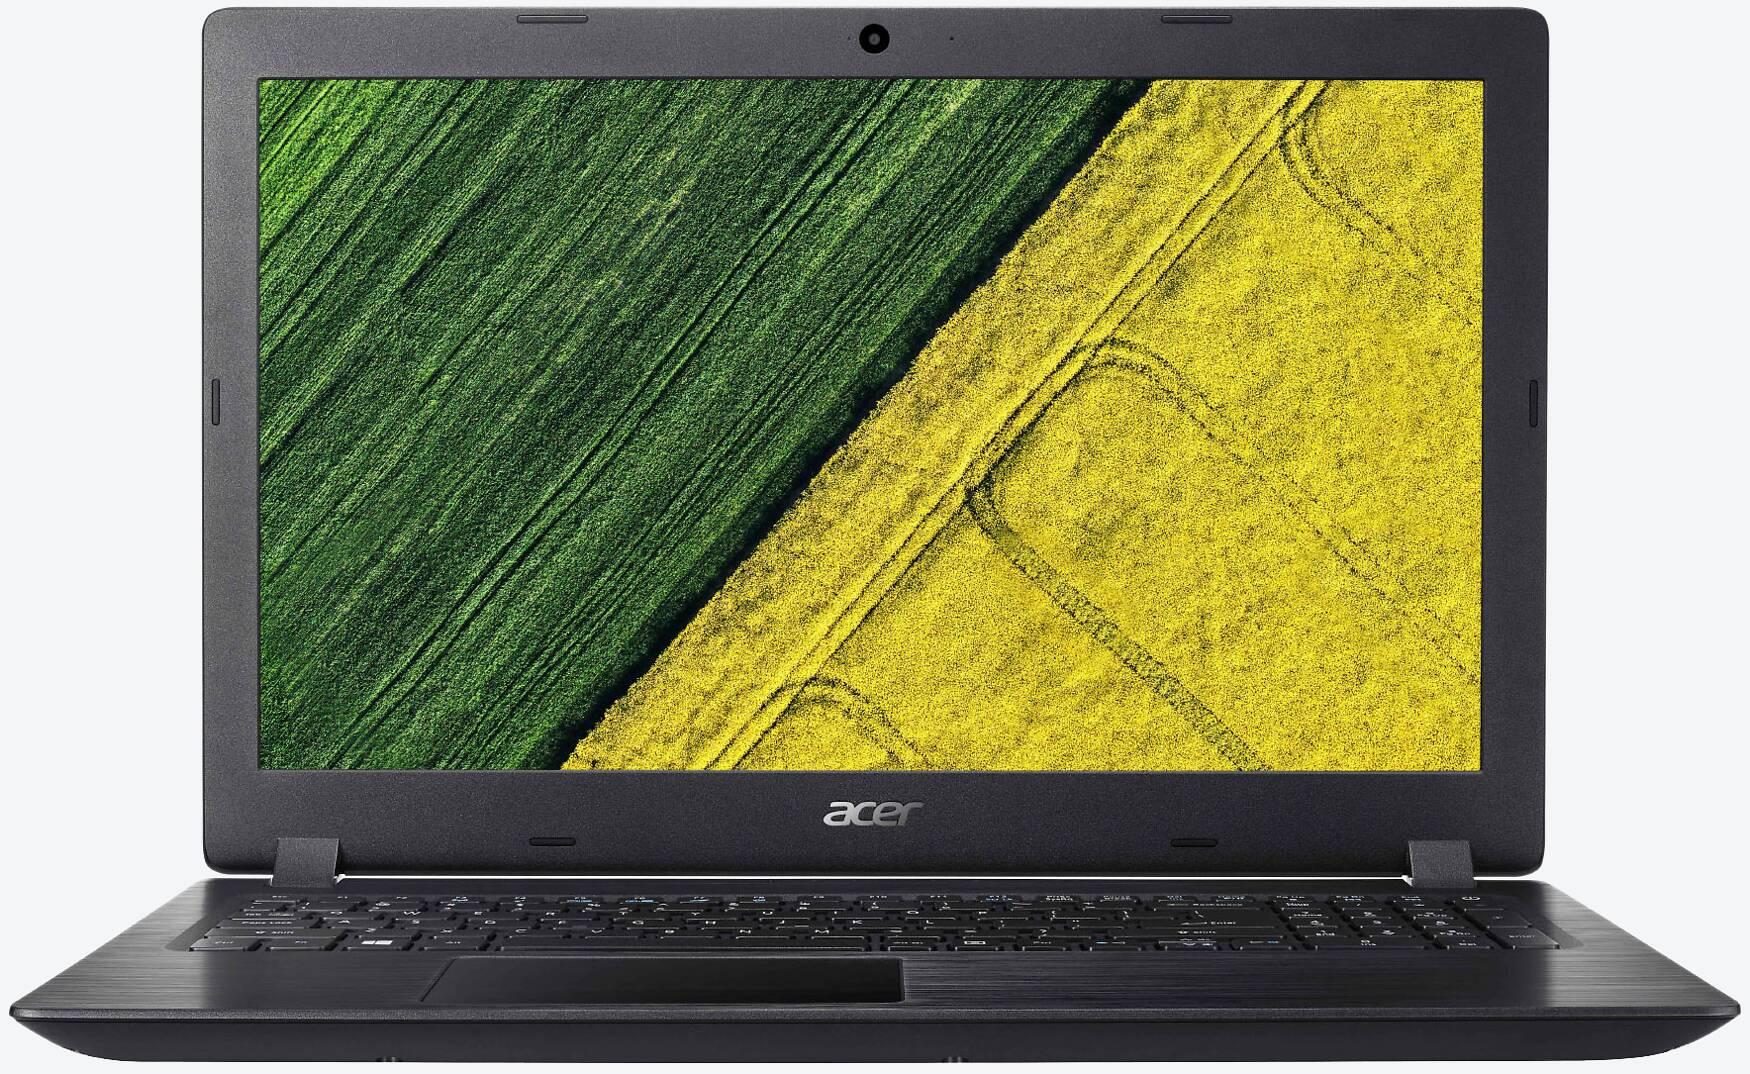 Acer Aspire 3 A317-32-P43T